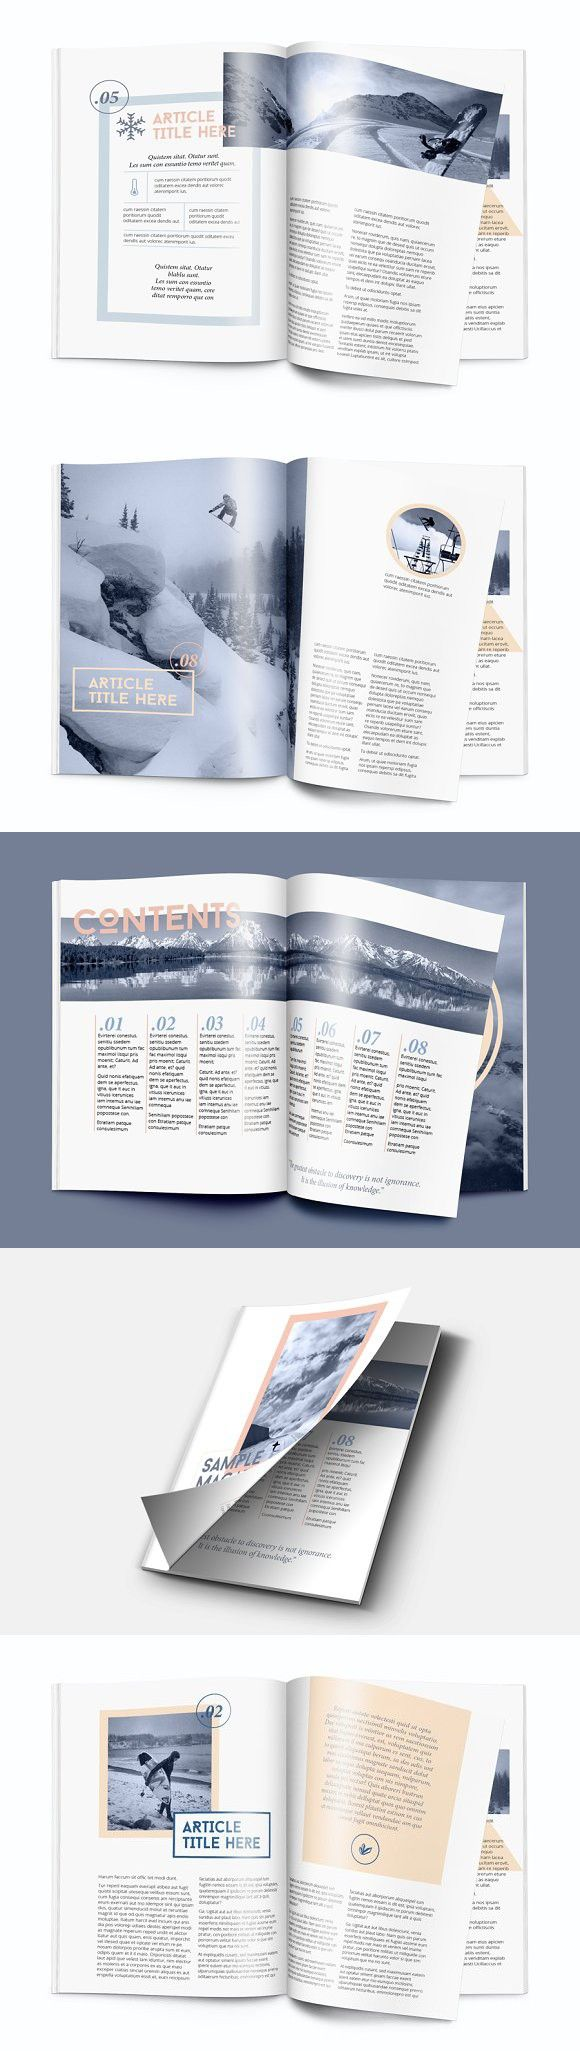 Magazine template - A4 - Indesign | Diseño editorial, Editorial y ...